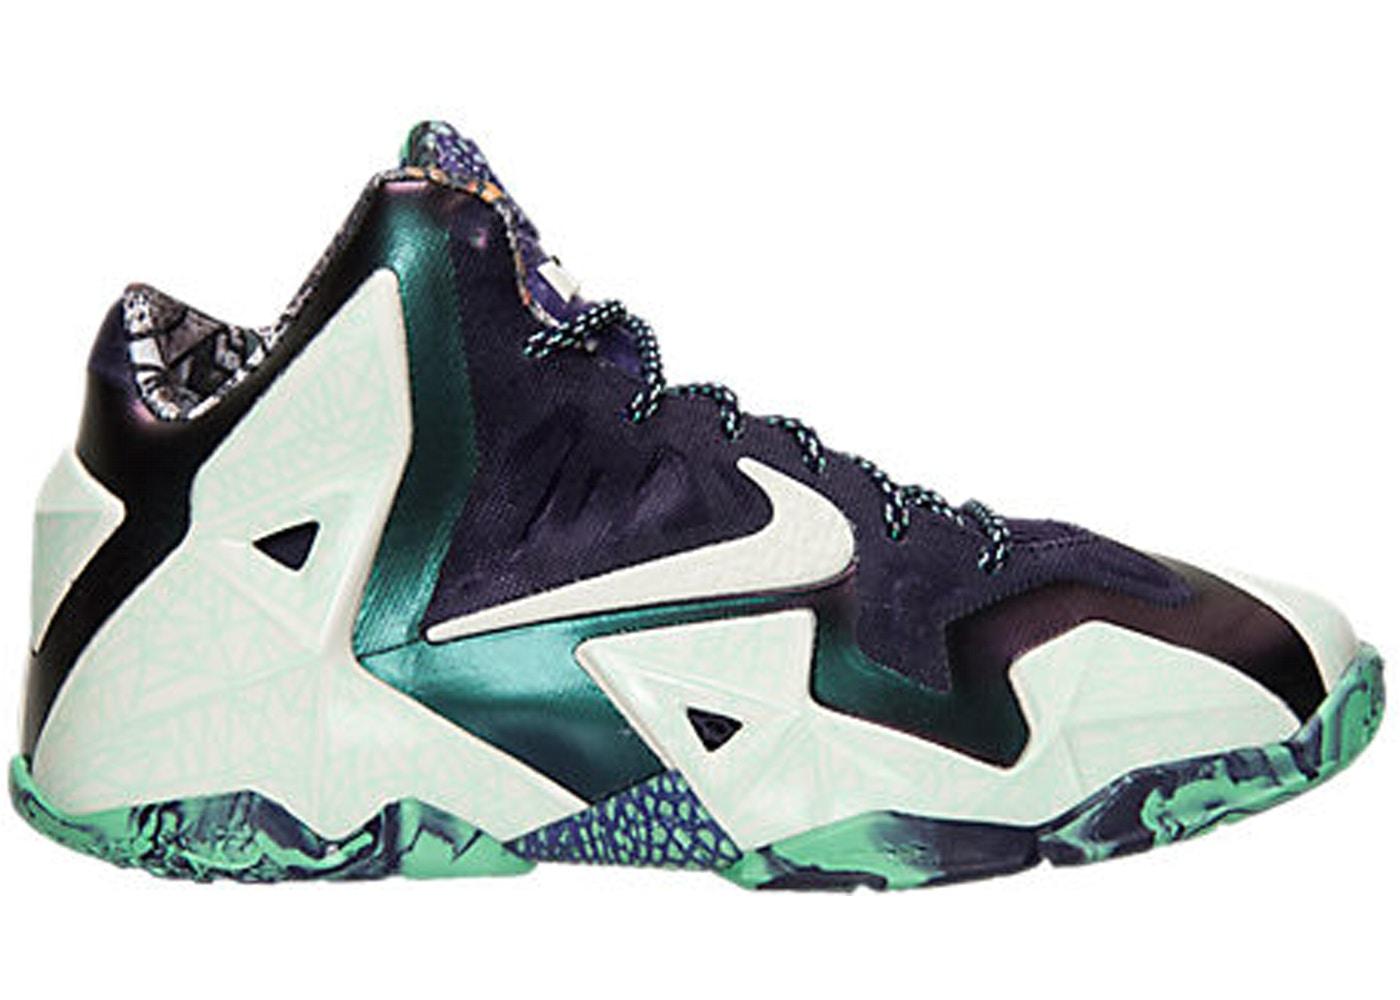 758fe011f87 Nike LeBron 11 Shoes - Average Sale Price